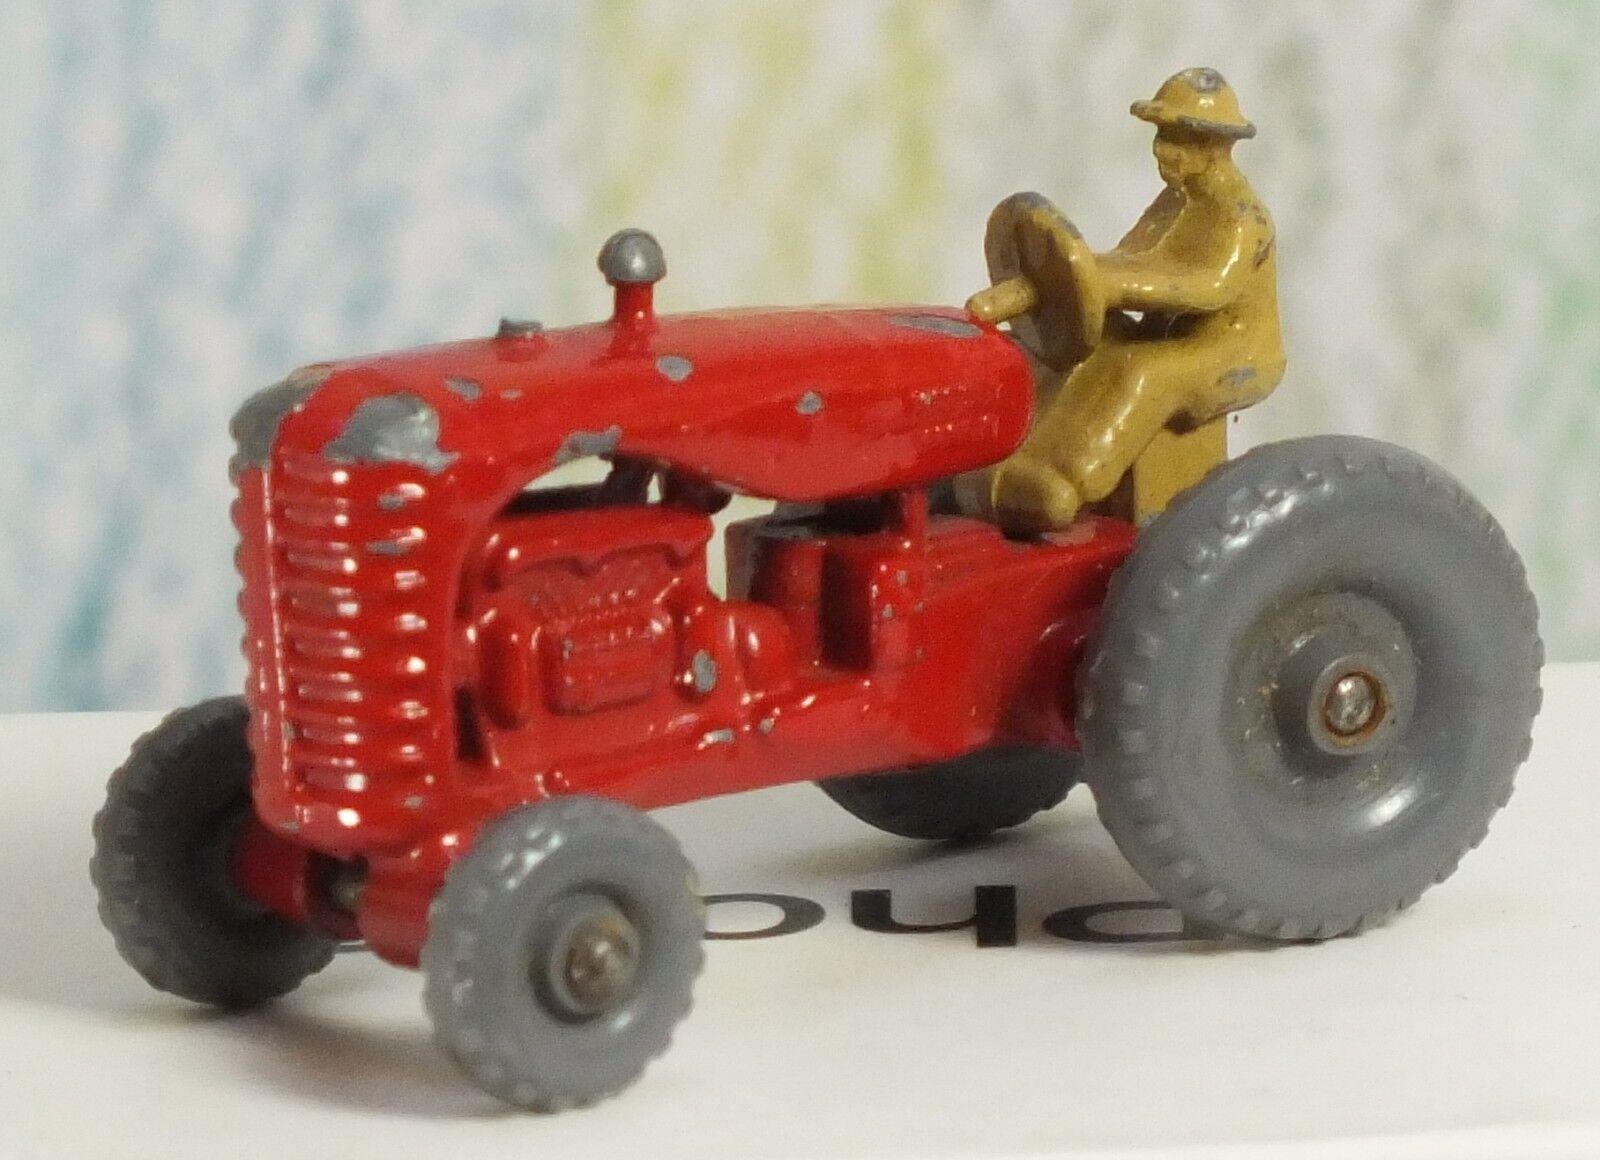 Matchbox Moko Lesney b red Massey Harris Harris Harris Tractor Plastic wheels tan driver a77698